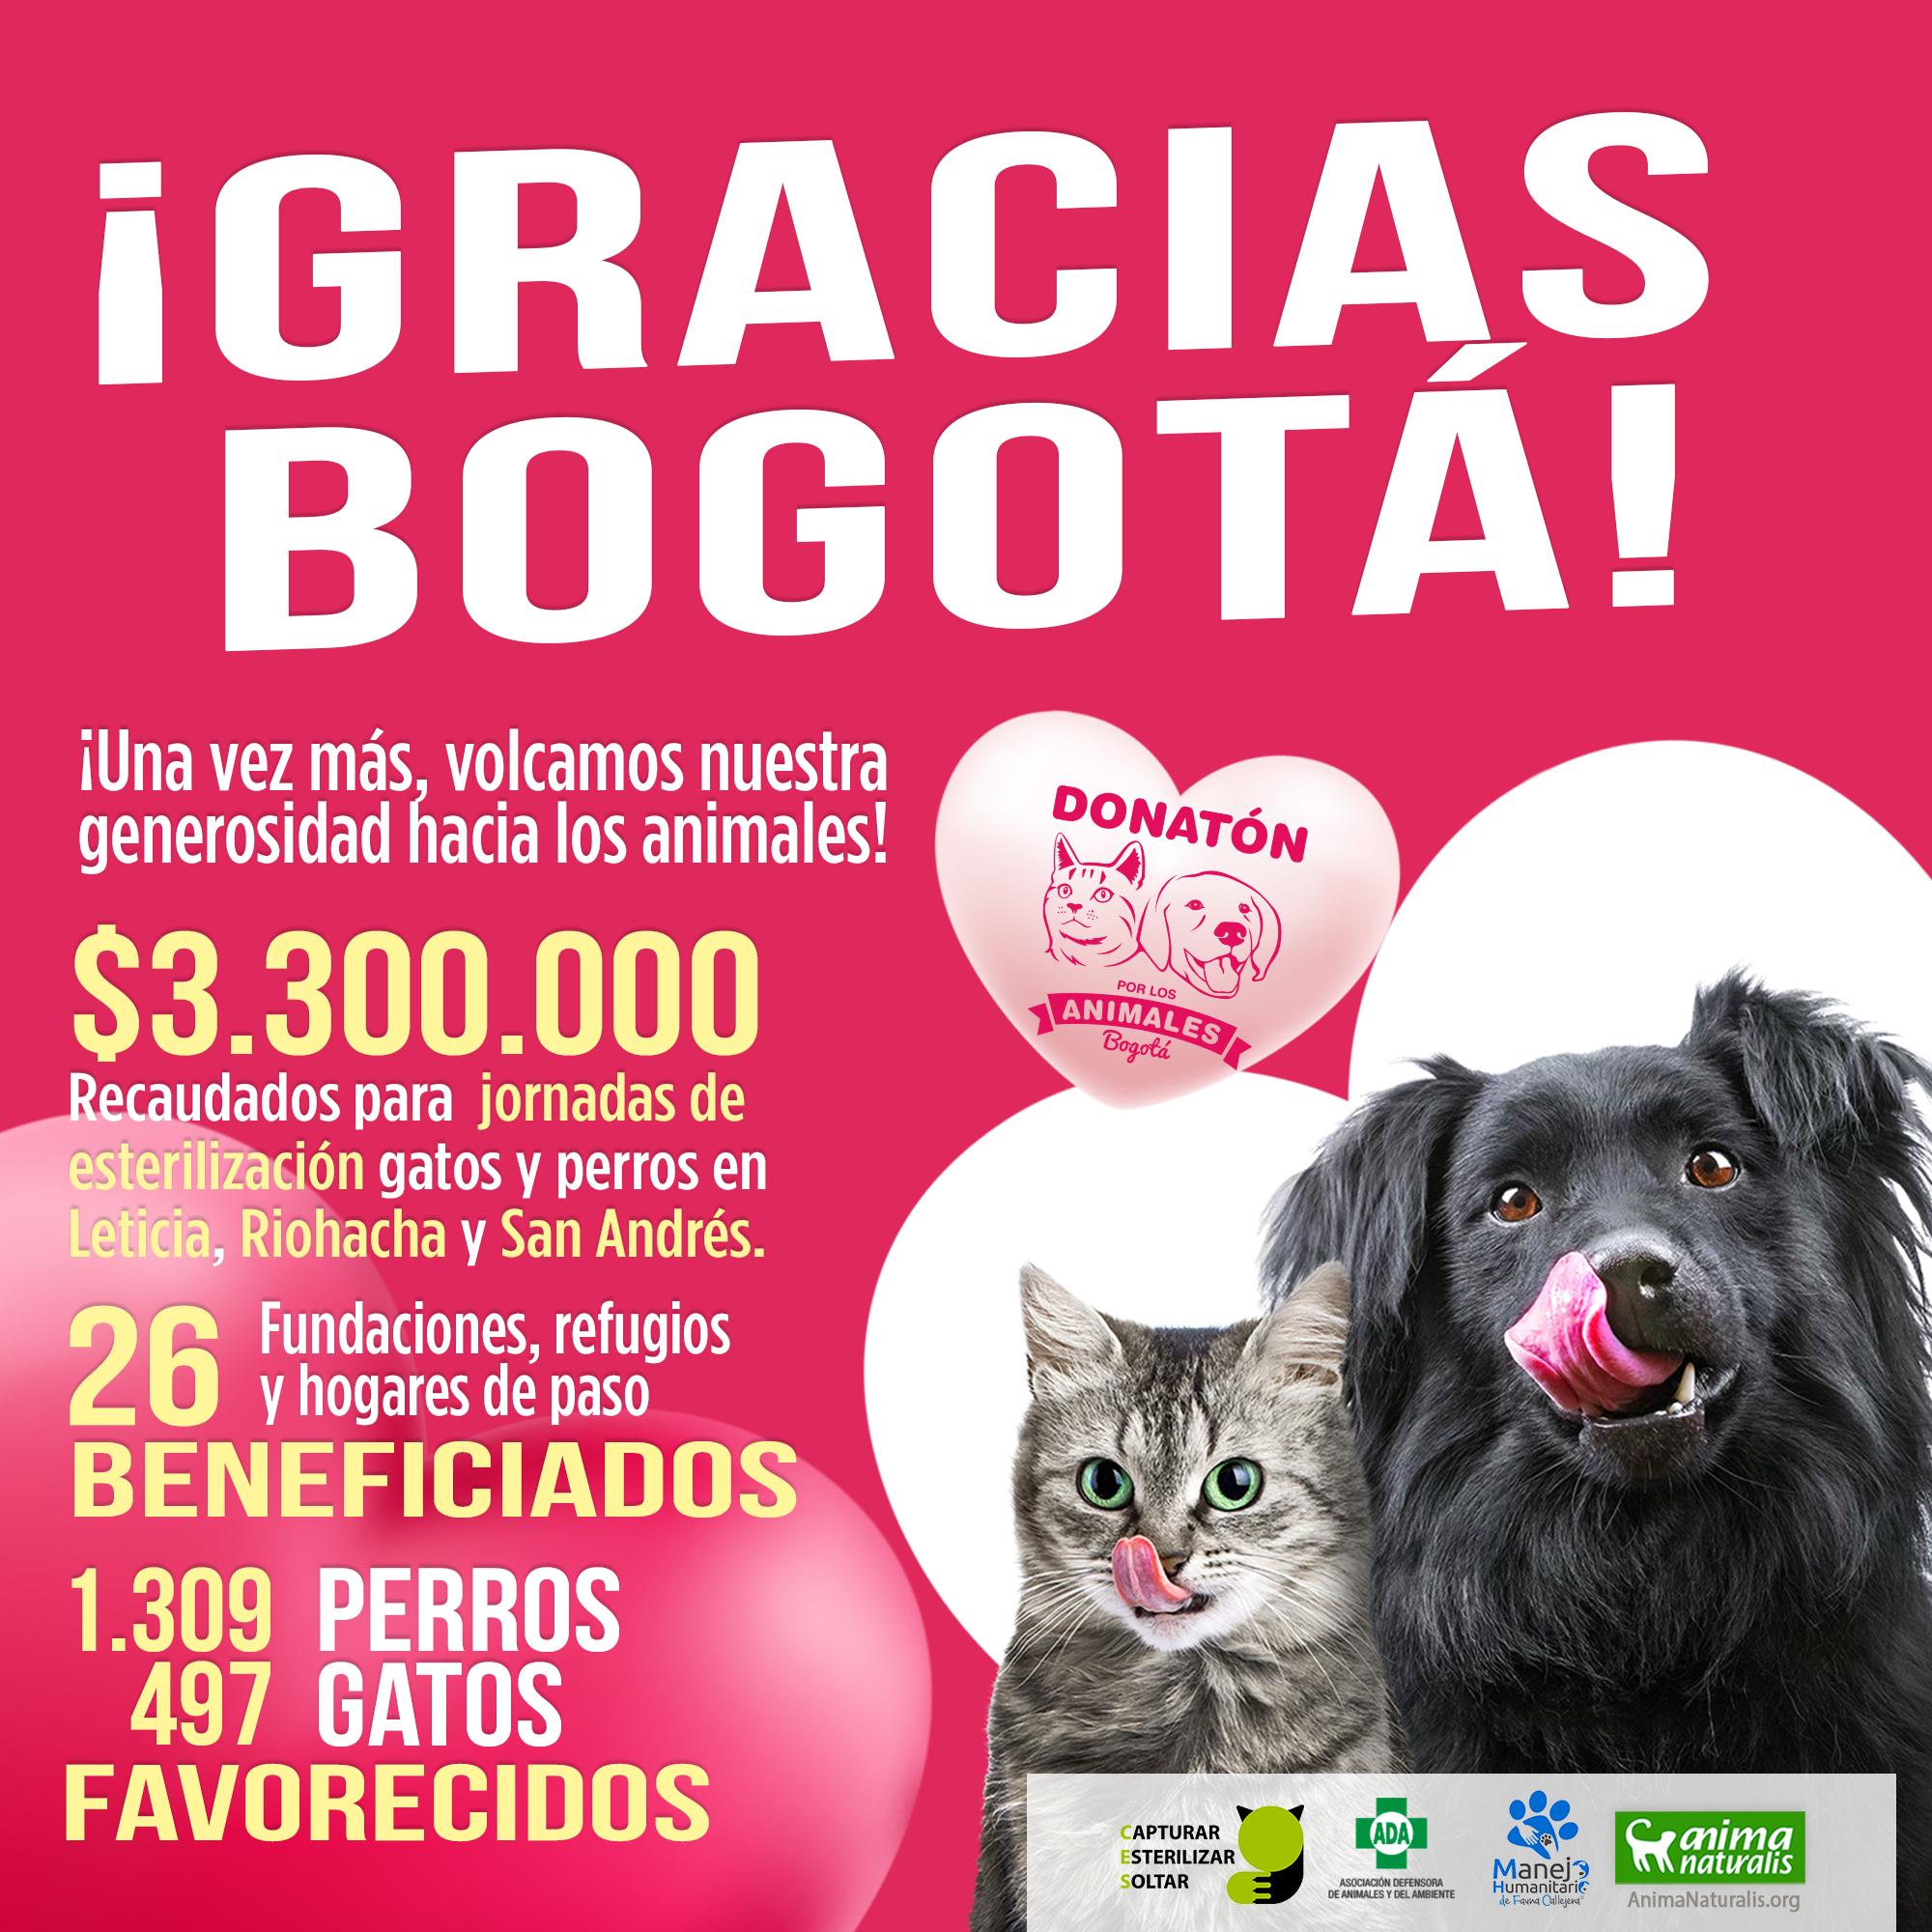 ¡Gracias Bogotá! 1.309 perros y 497 gatos serán beneficiados con Donatón